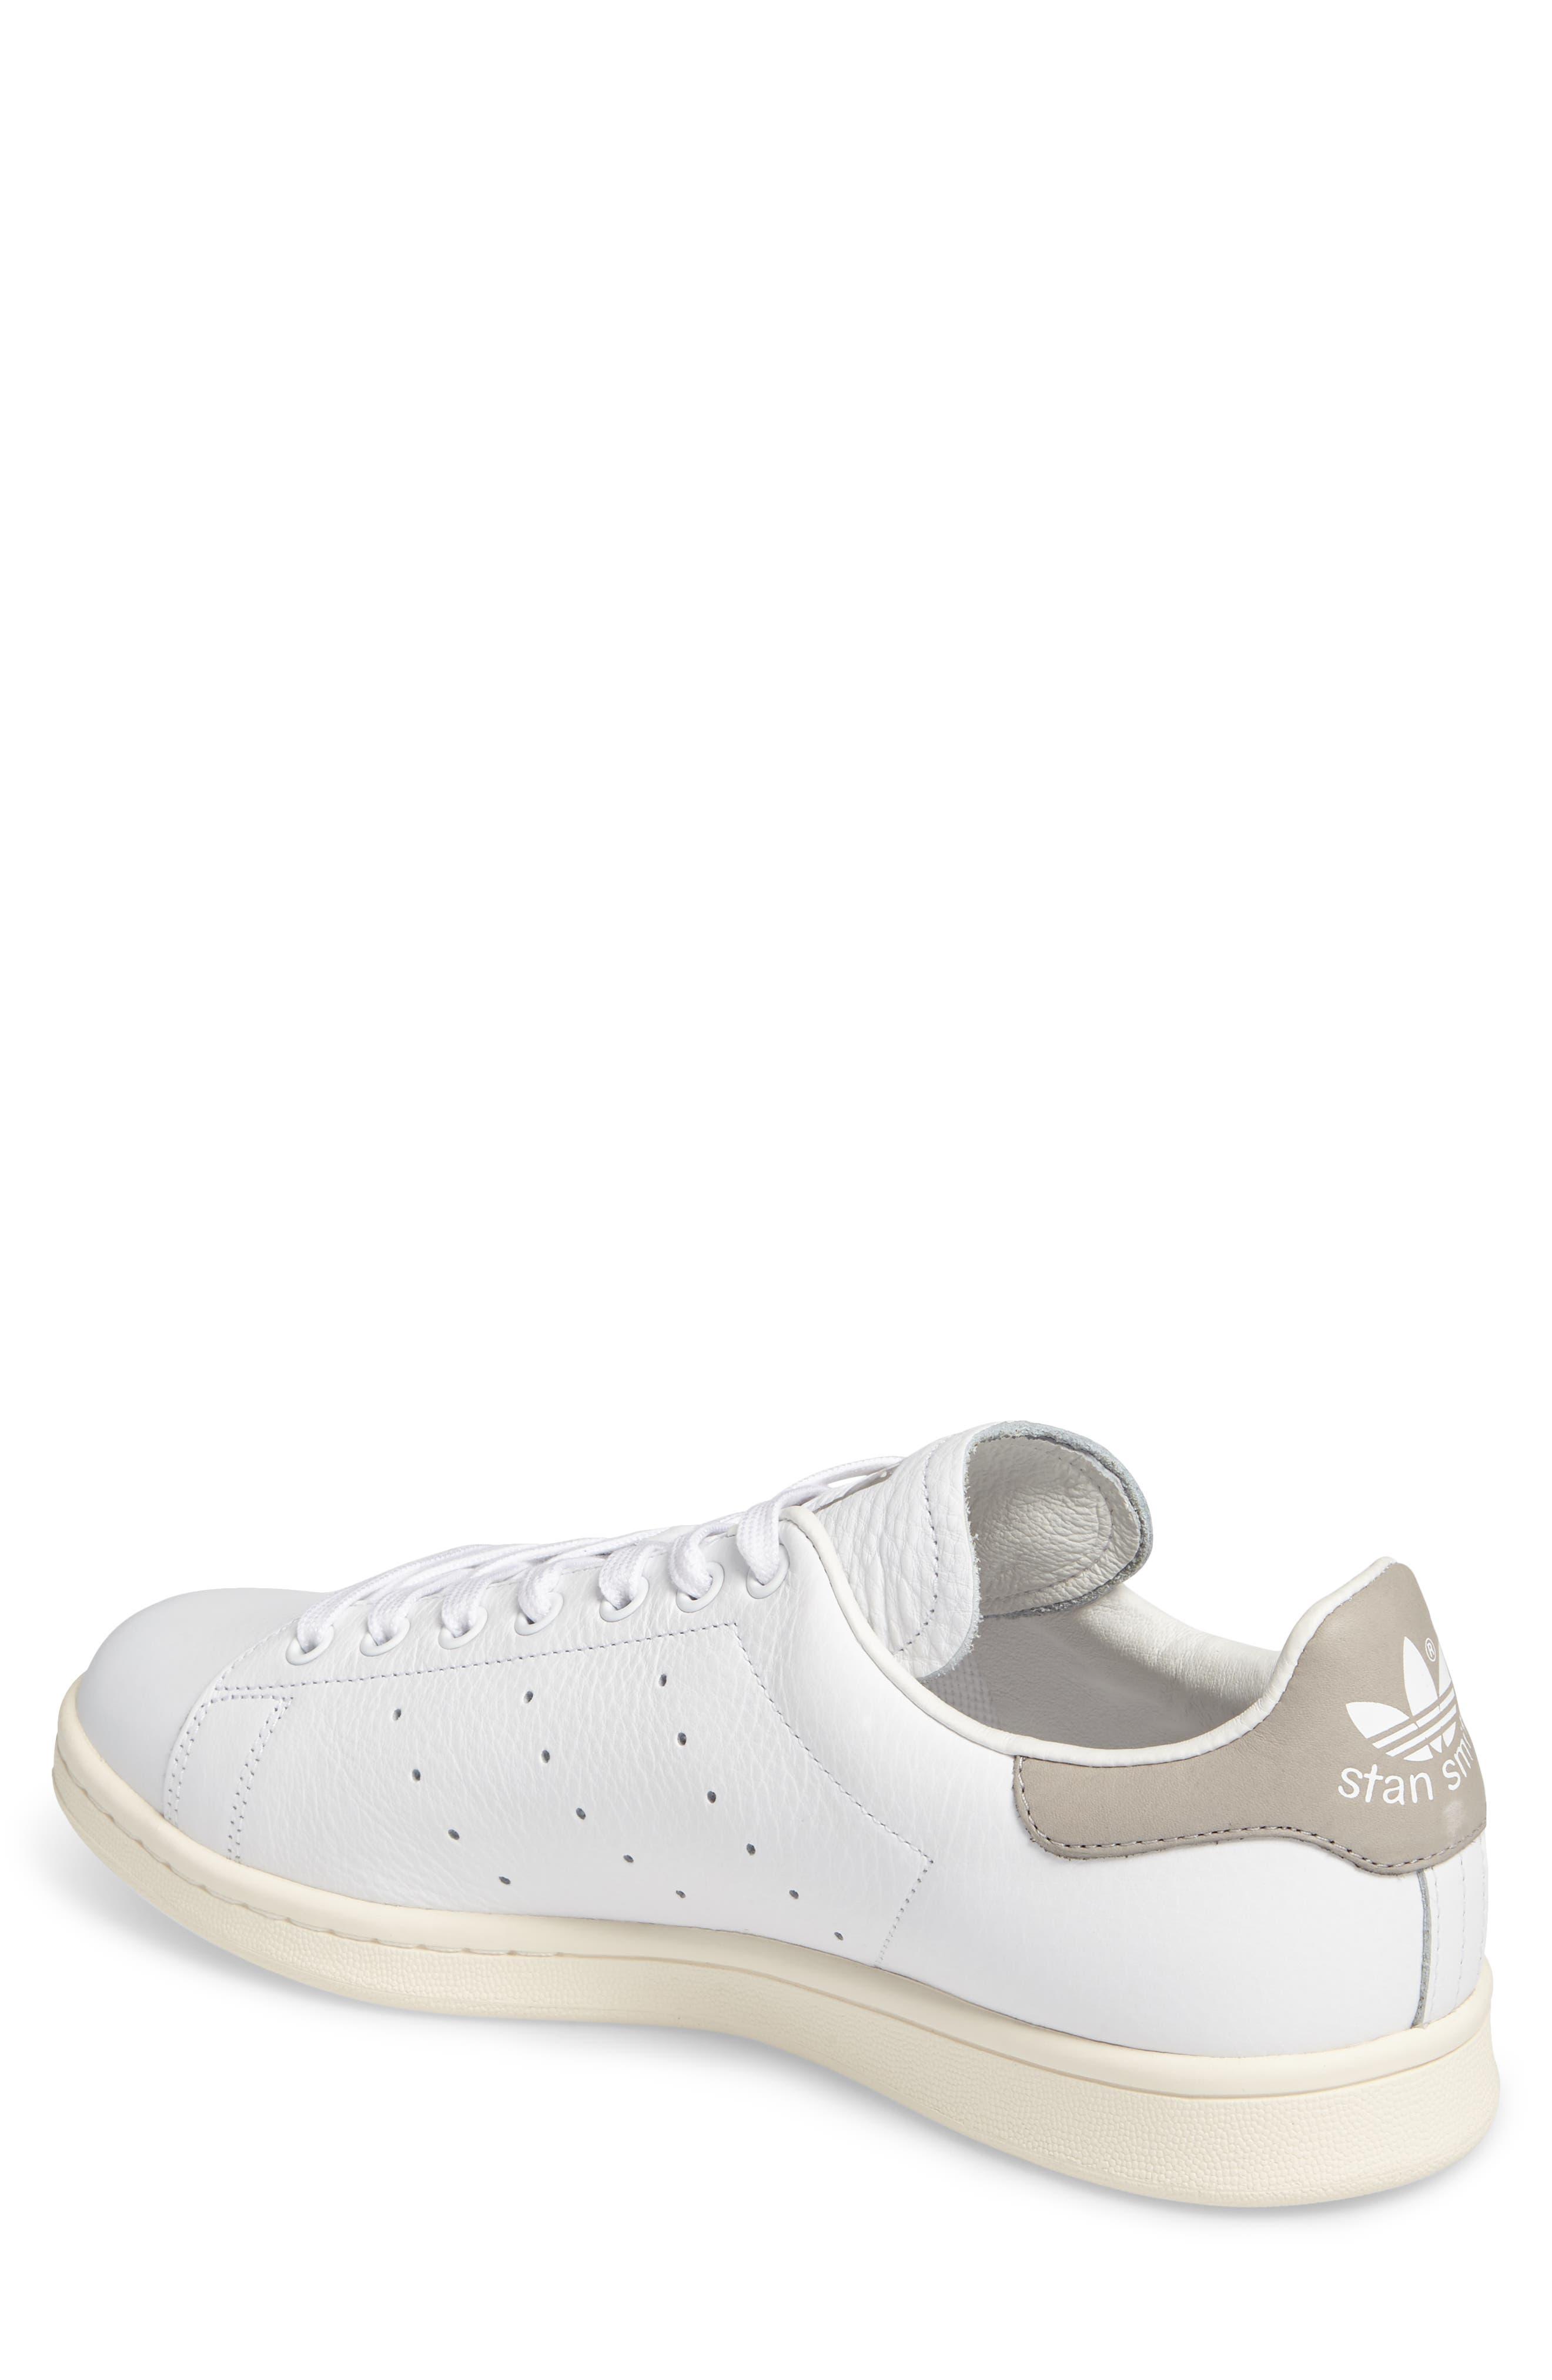 Stan Smith Sneaker,                             Alternate thumbnail 2, color,                             100